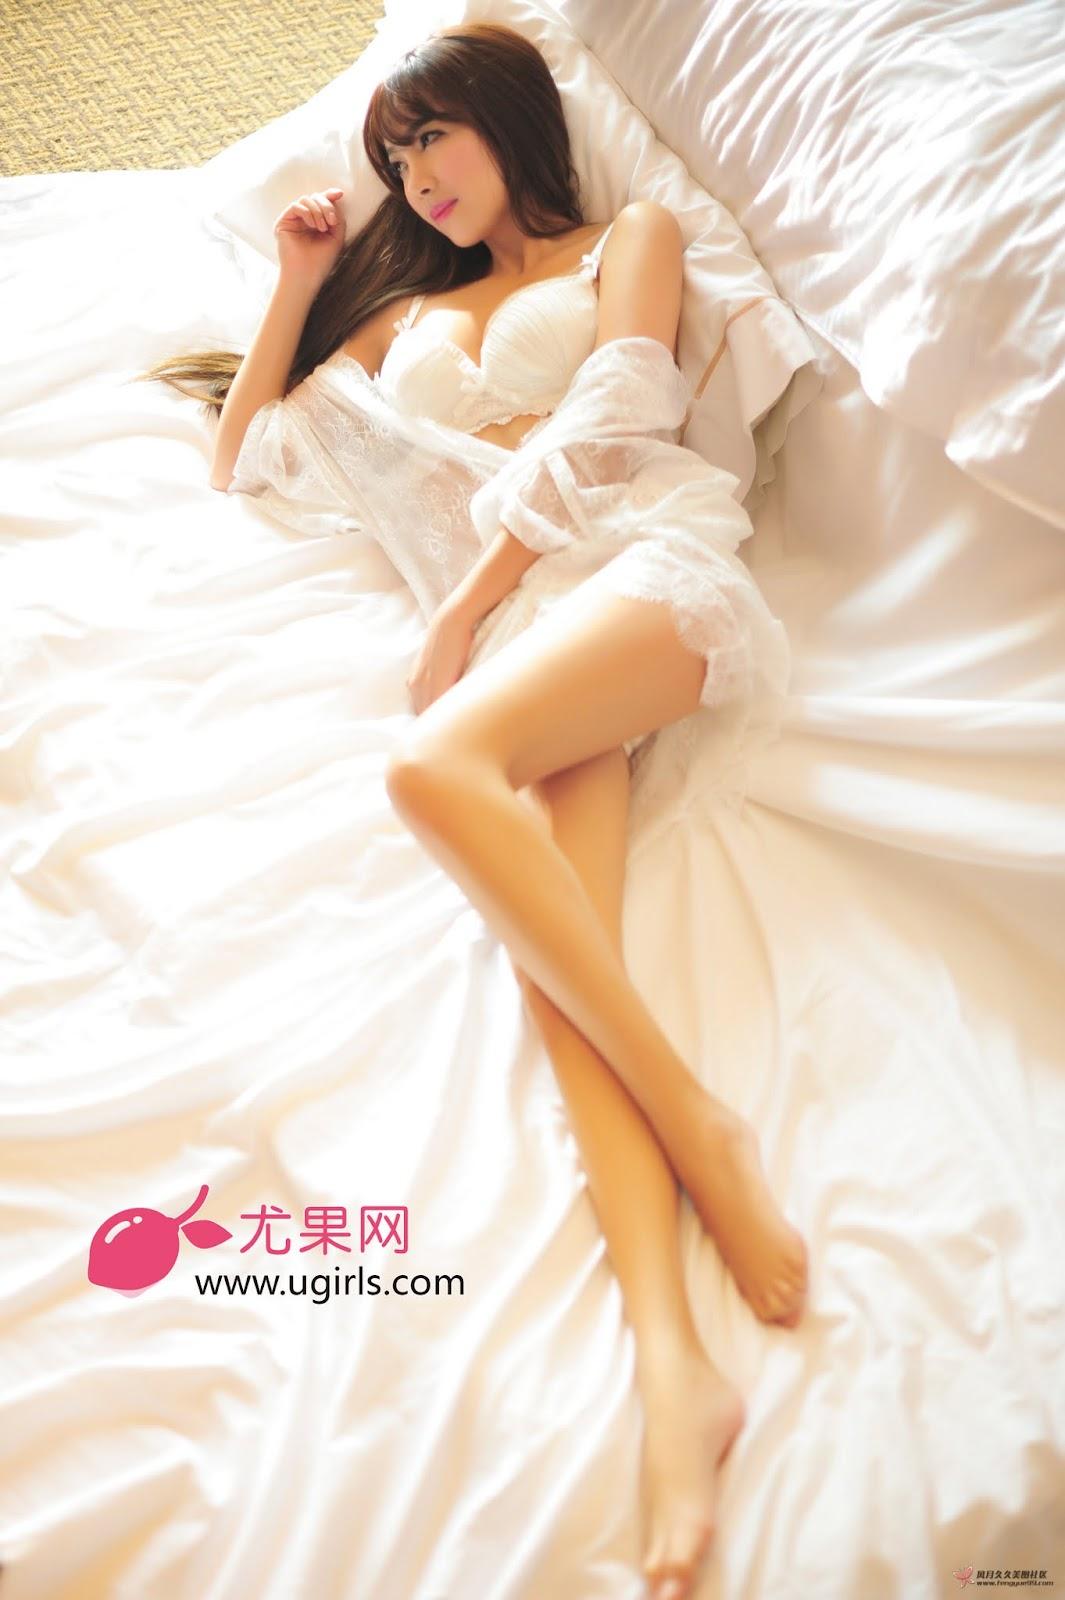 DLS 4570 - Hot Girl Model UGIRLS NO.13